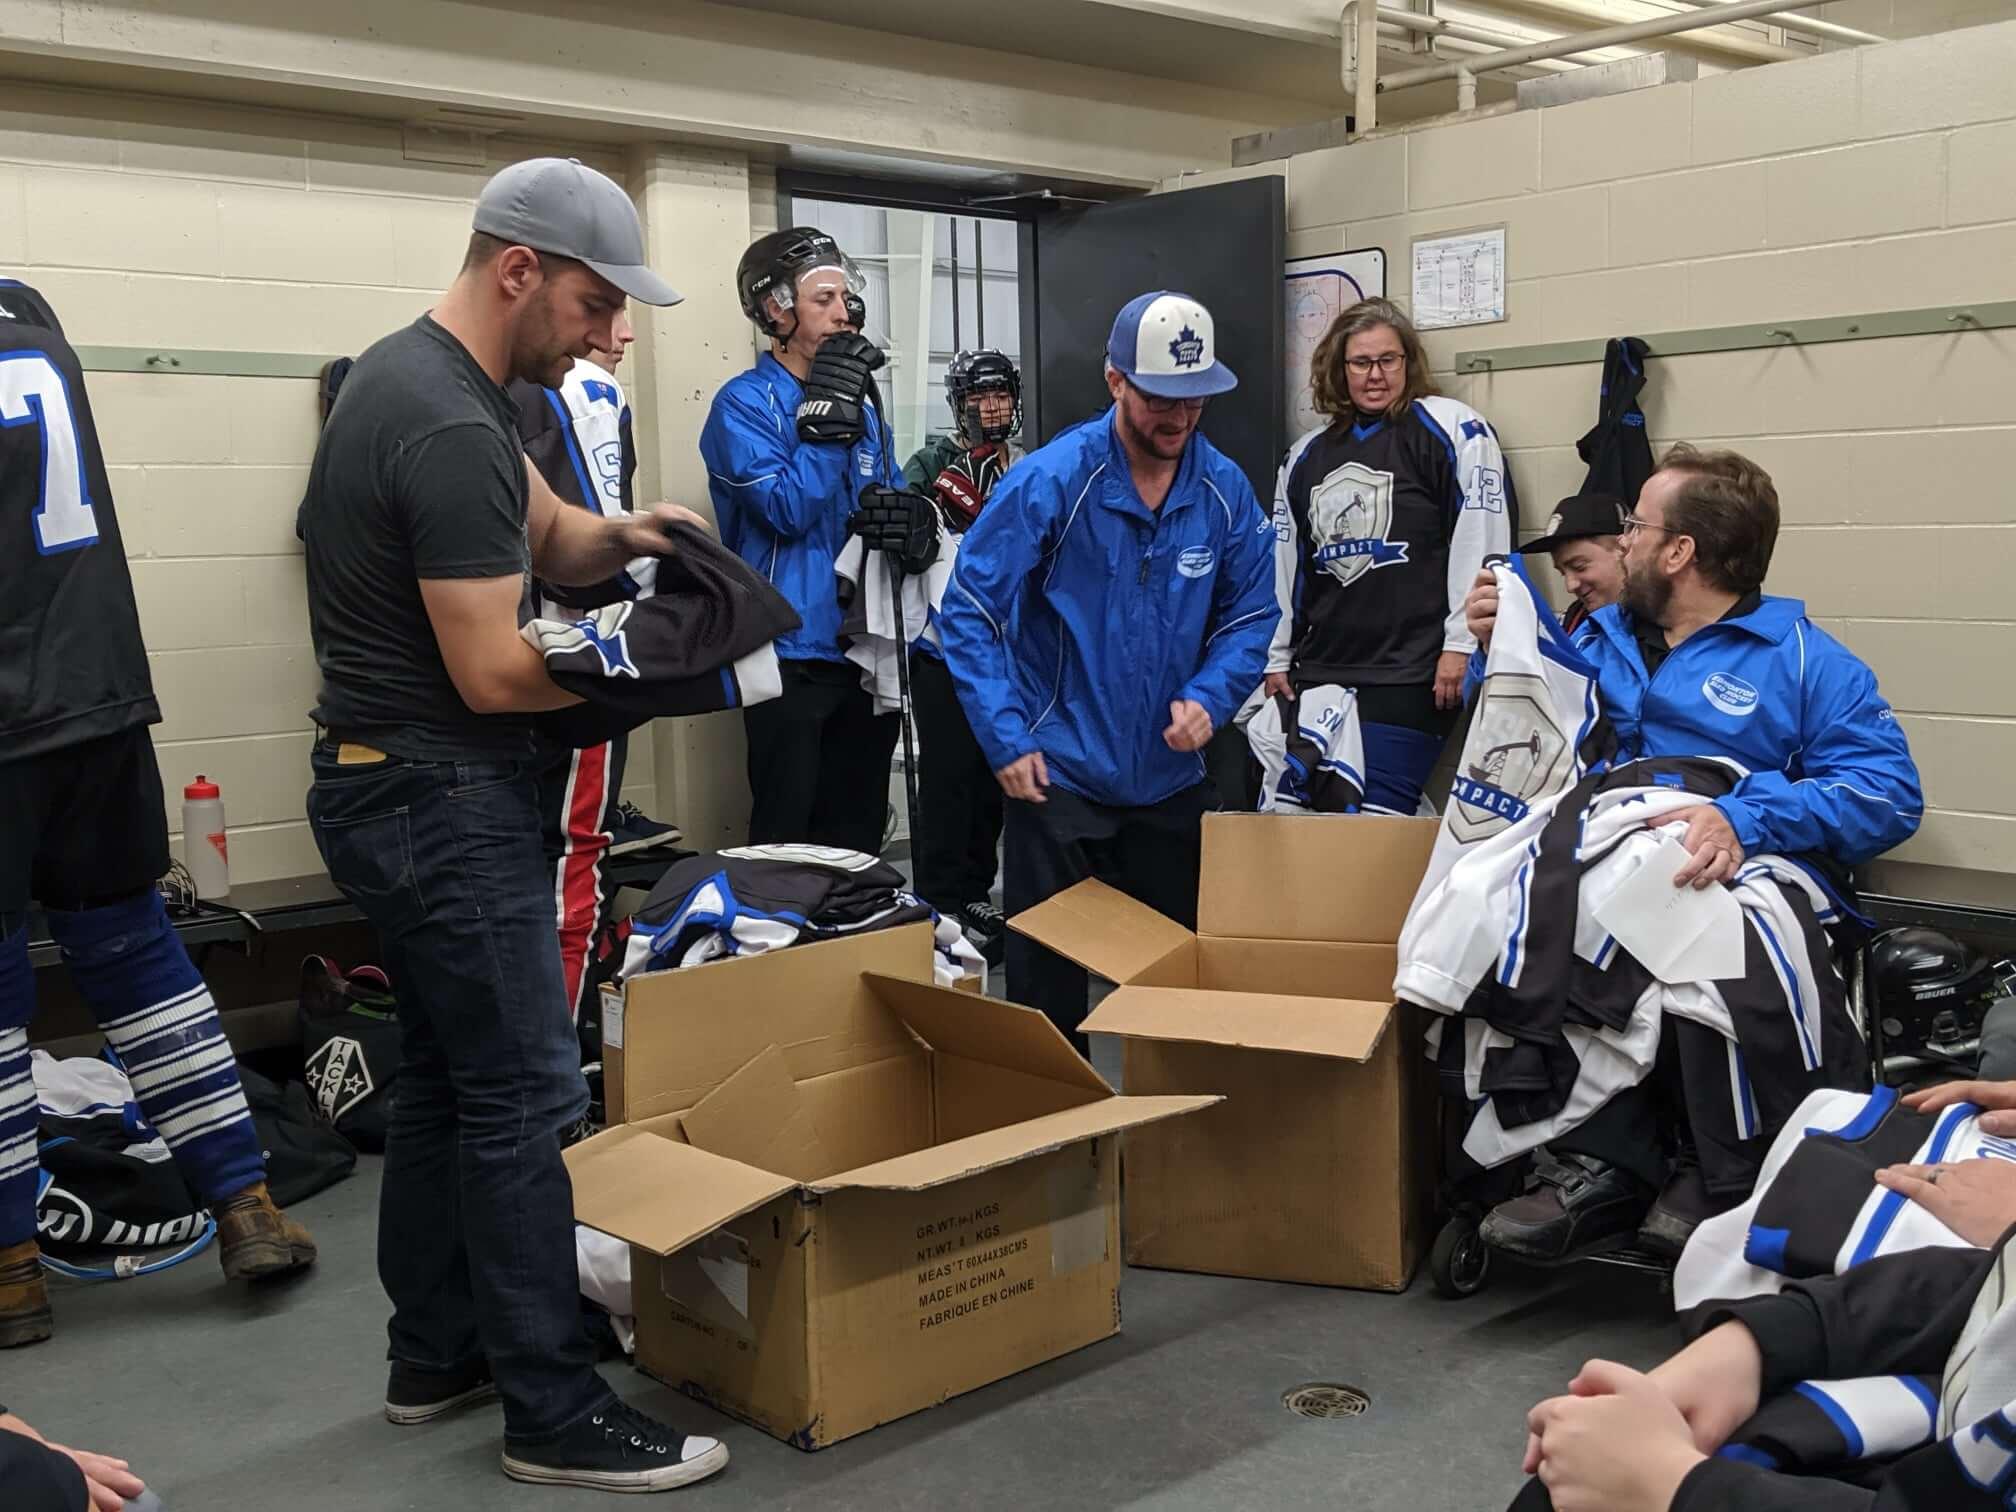 Edmonton Sled Hockey Club